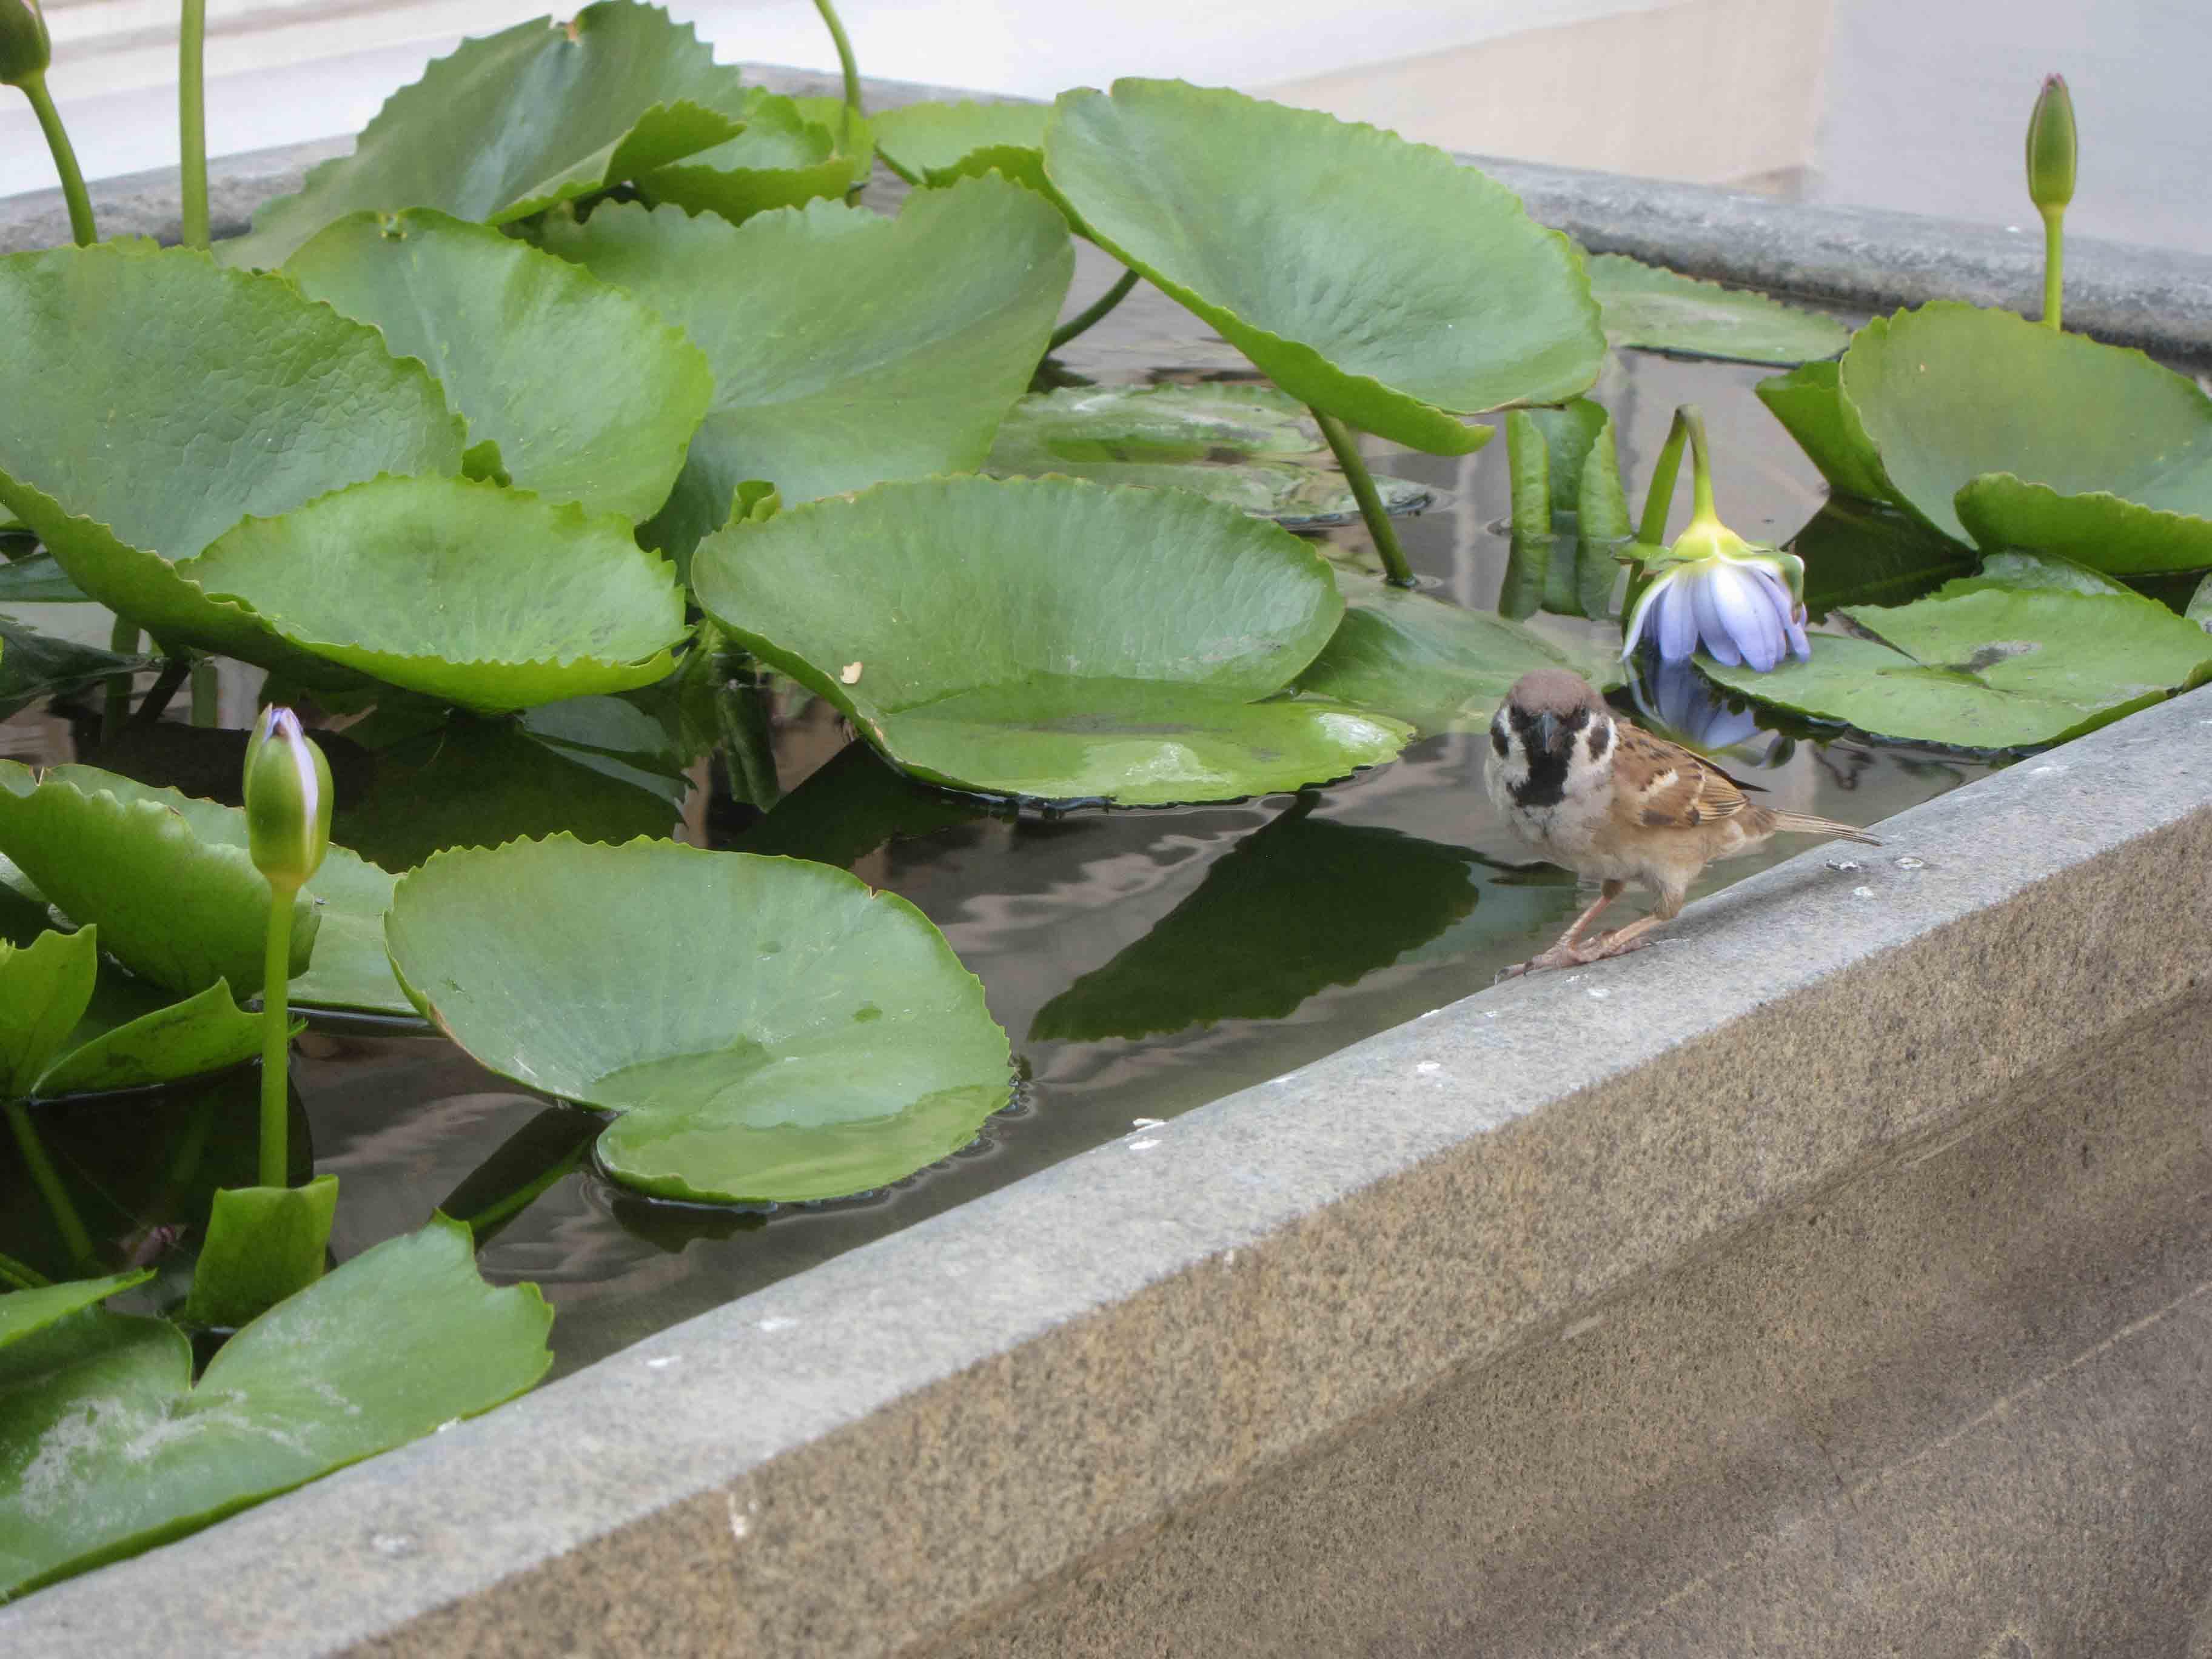 Oiseau-et-lotus-Wat-Phra-Kaew-Bangkok-Thailande.jpg